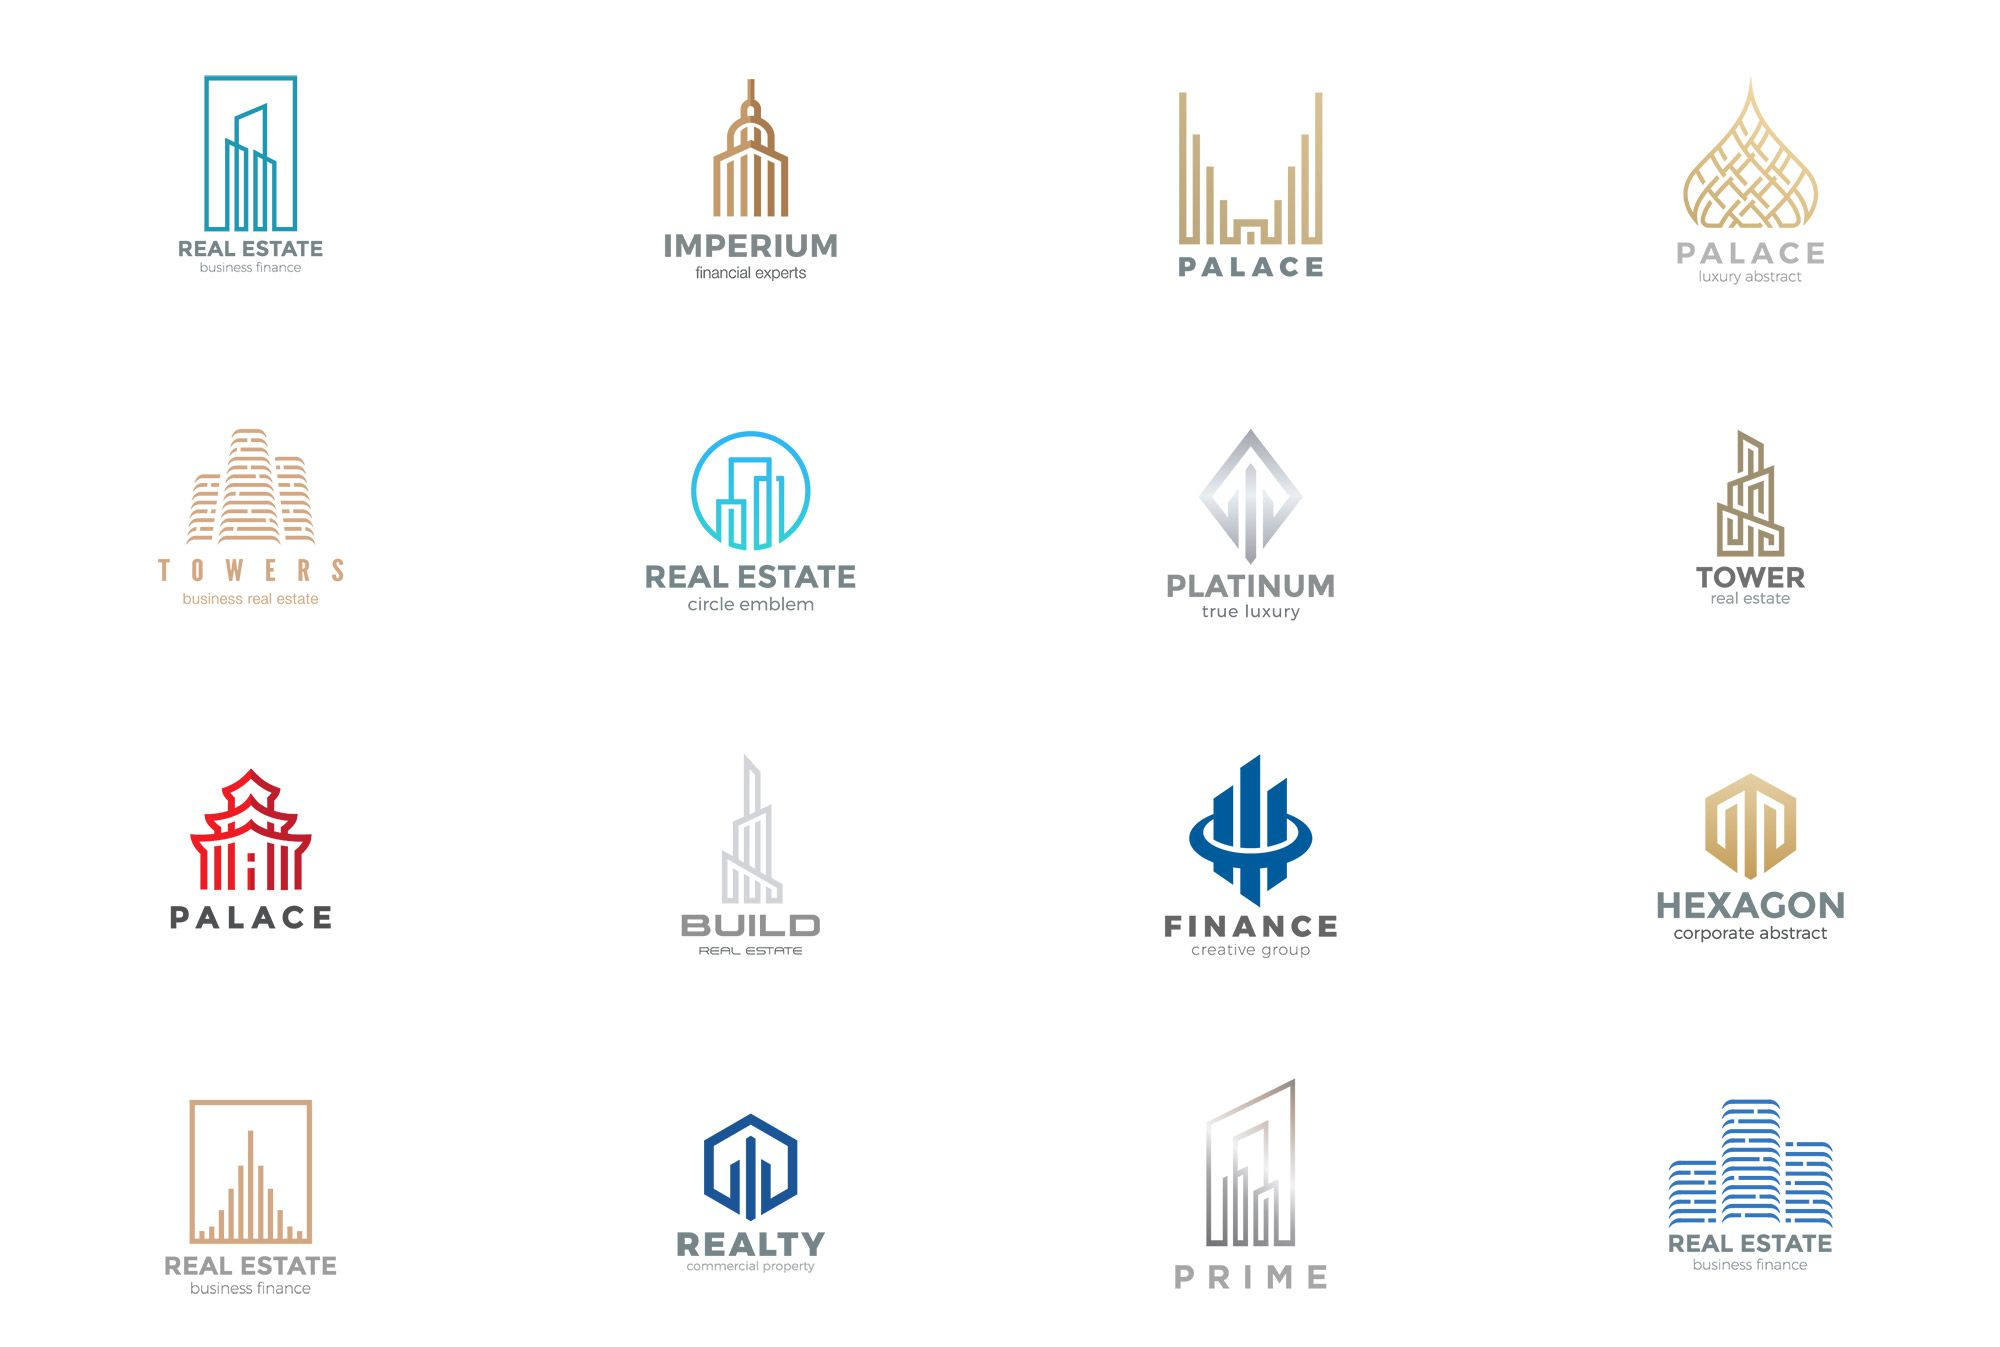 40个现代房地产金融徽标LOGO模板 Modern Real Estate Logos